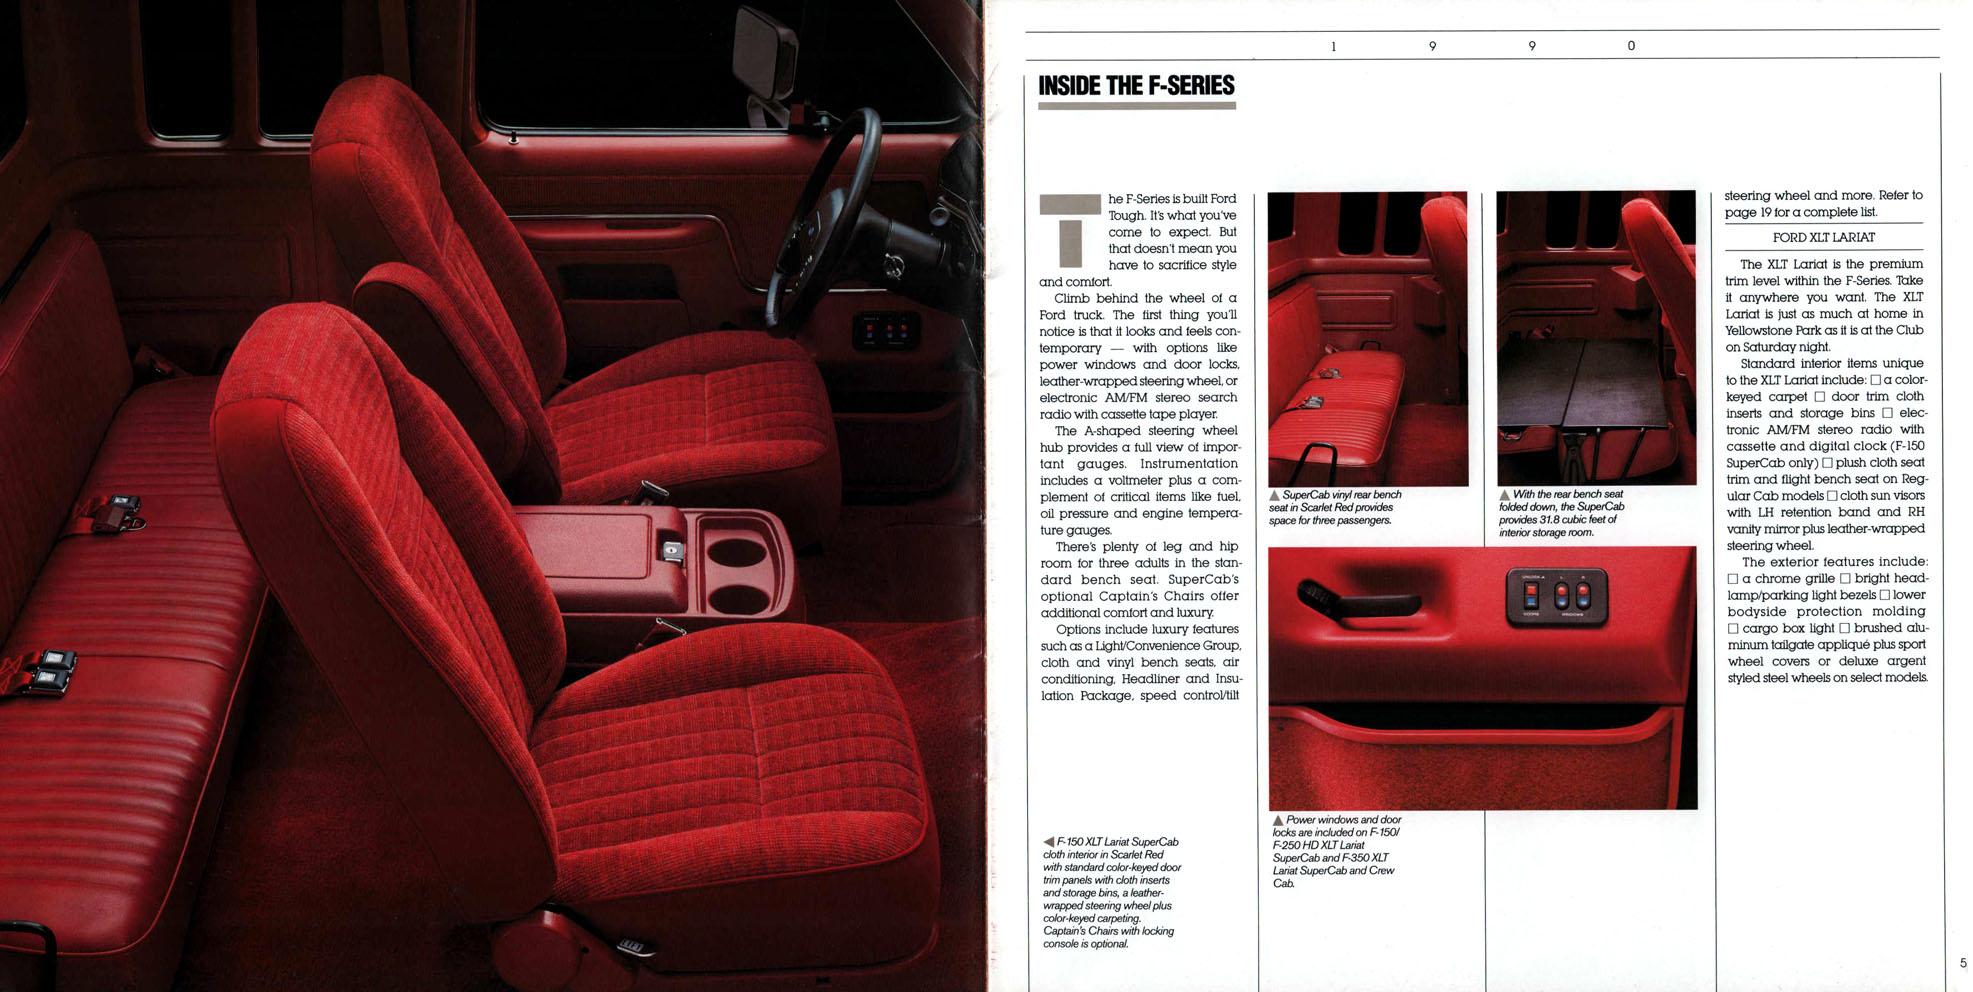 Pleasing Lov2Xlr8 No Machost Co Dining Chair Design Ideas Machostcouk